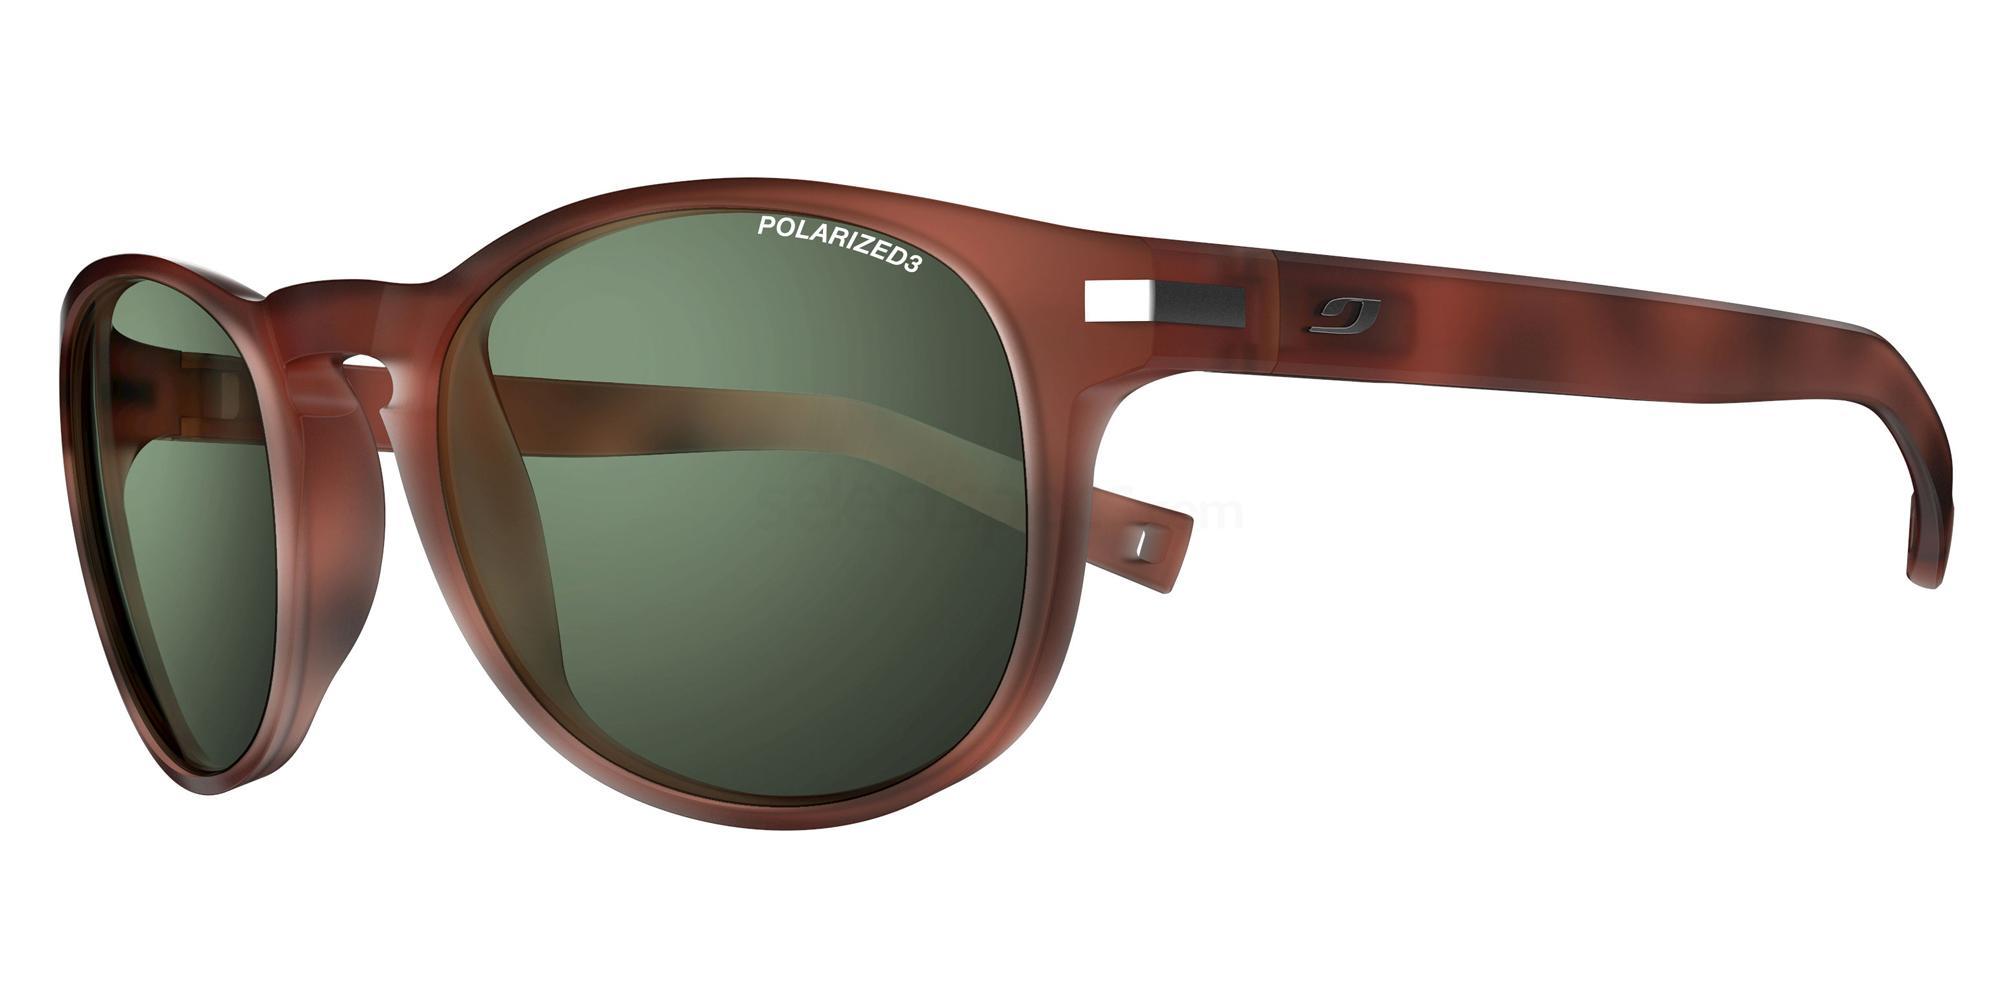 9047 493 VALPARAISO Sunglasses, Julbo